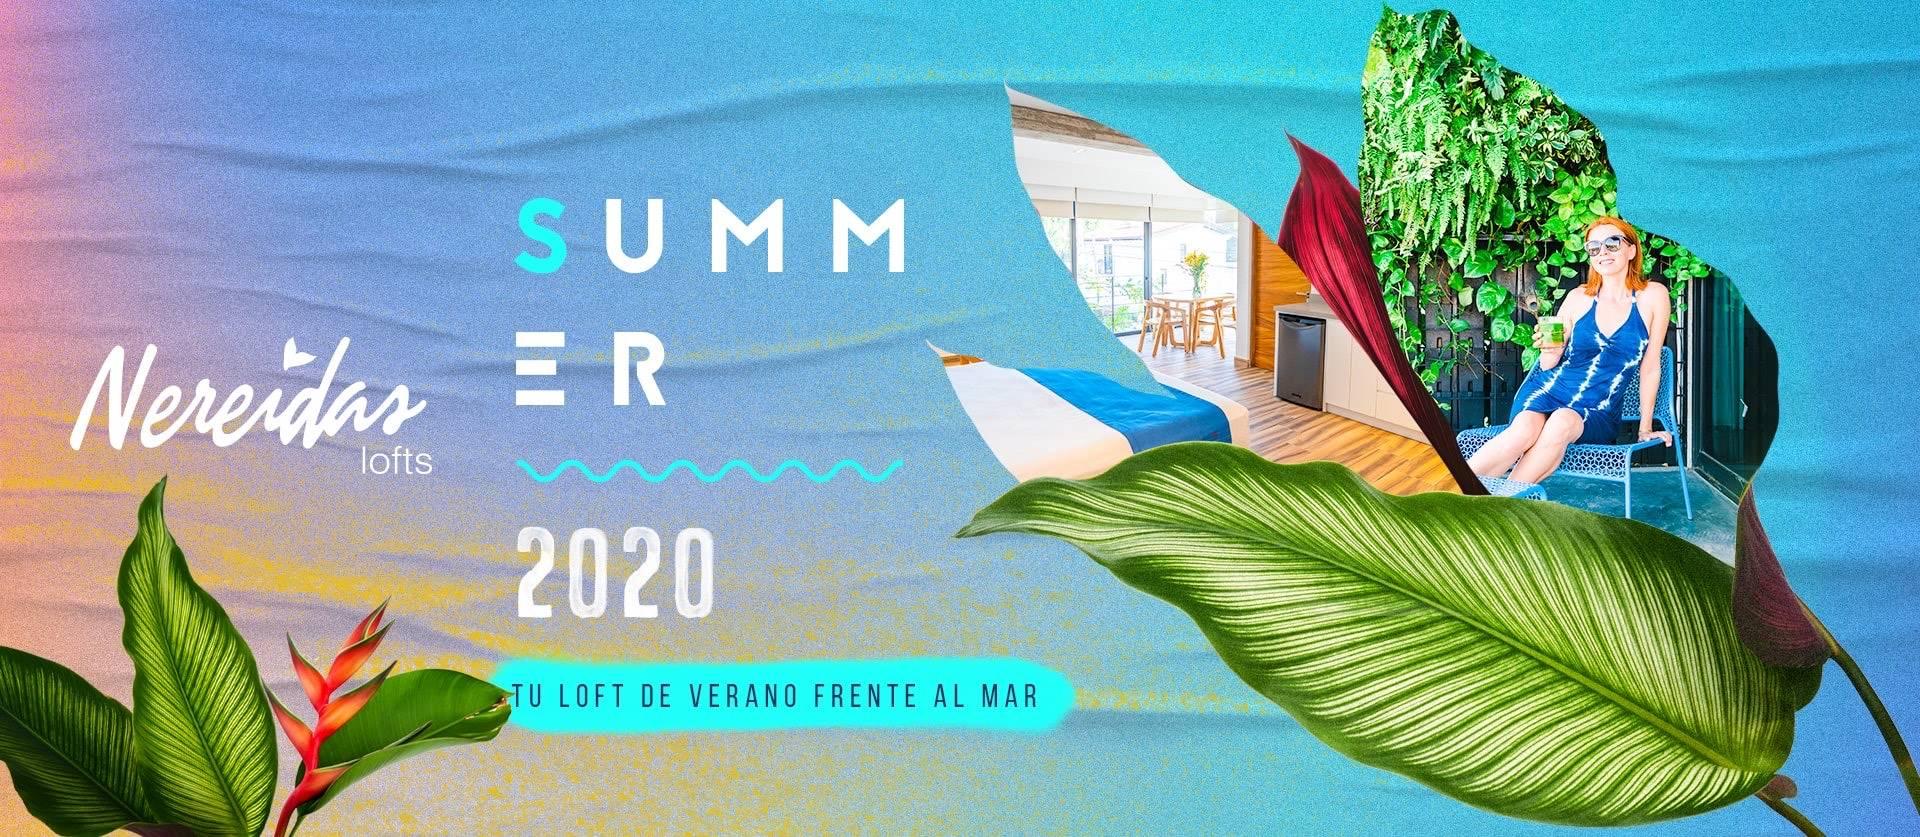 Nereidas Lofts Summer Promo